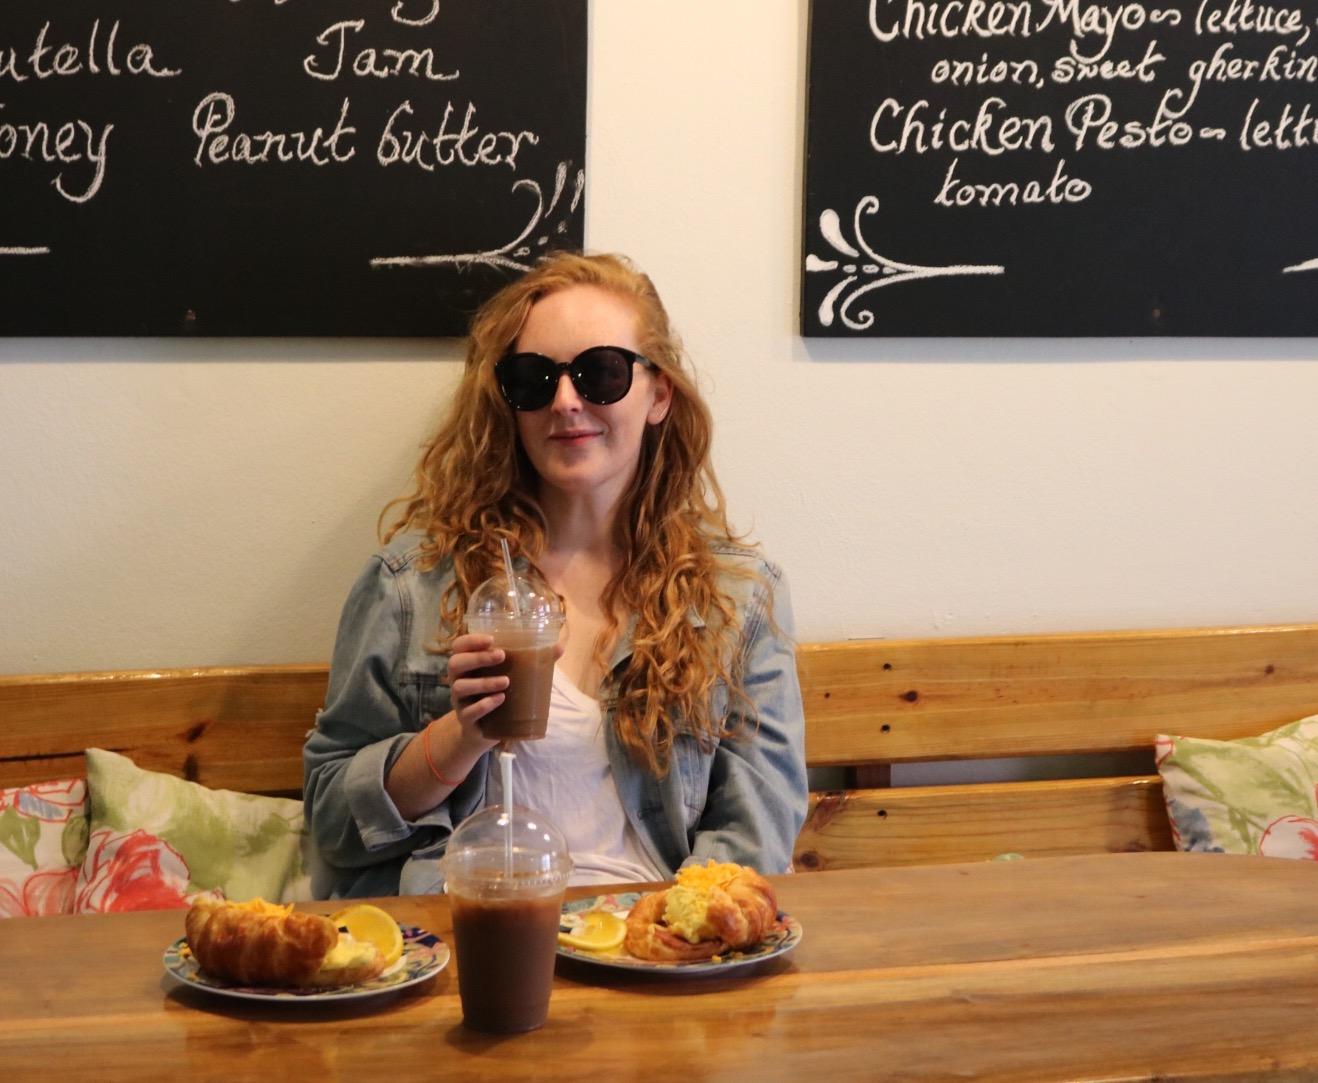 alexandria owen and her food.jpg